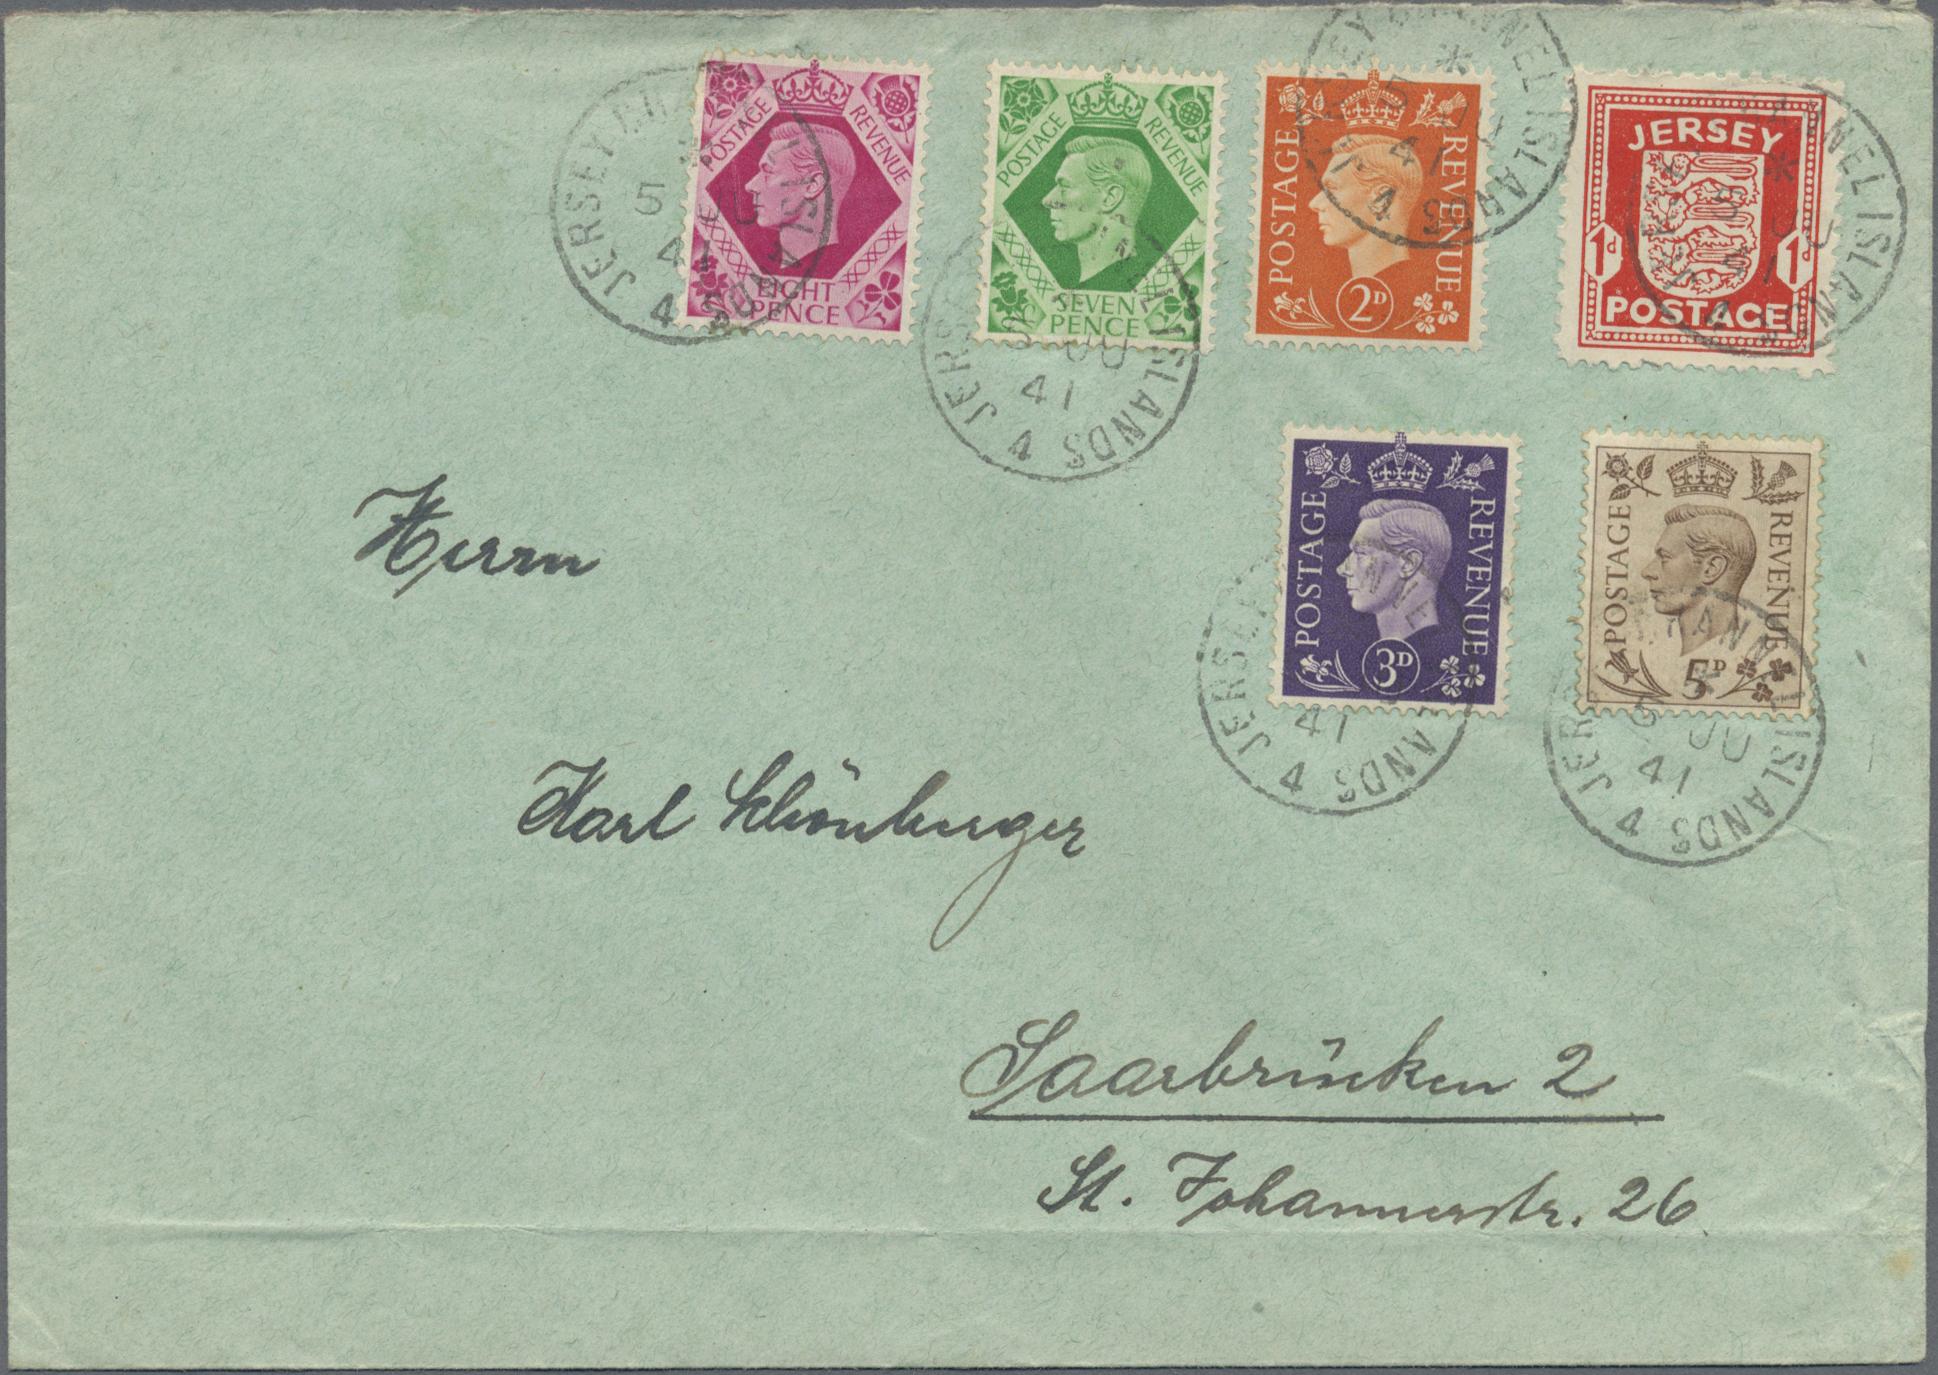 Lot 35242 - deutsche besetzung ii. wk  -  Auktionshaus Christoph Gärtner GmbH & Co. KG Sale #44 Collections Germany